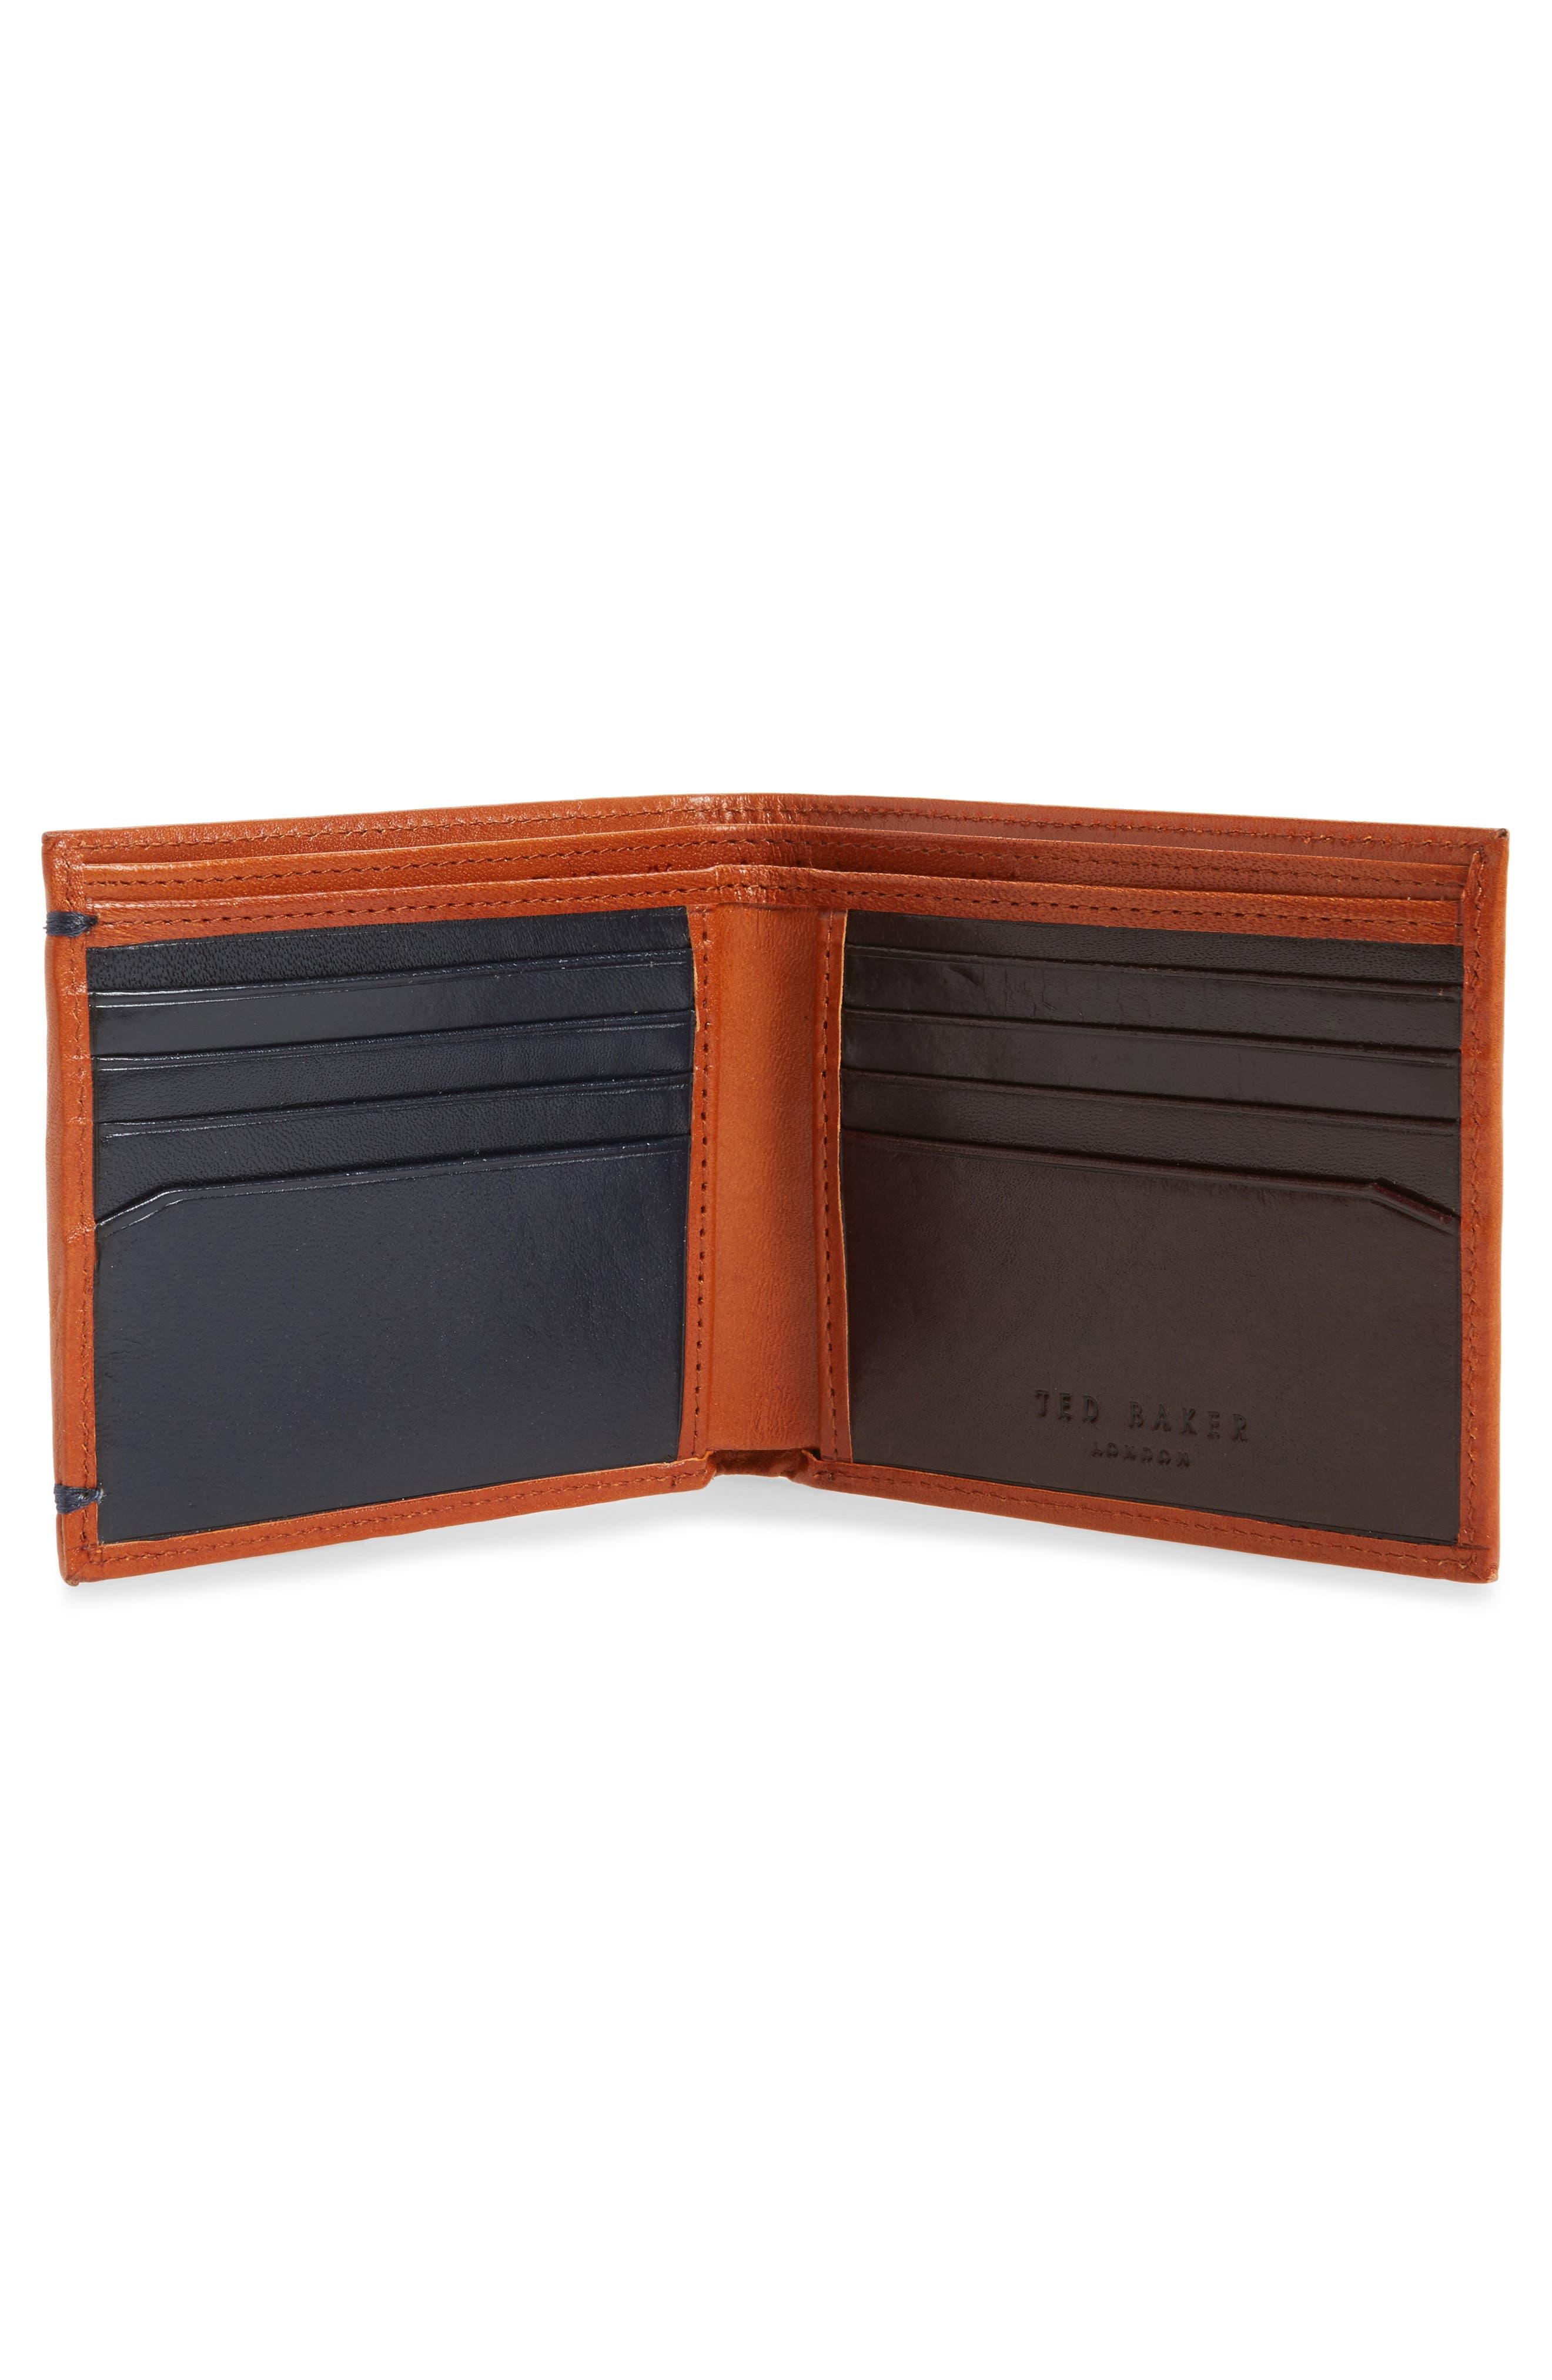 Vivid Leather Wallet,                             Alternate thumbnail 2, color,                             217